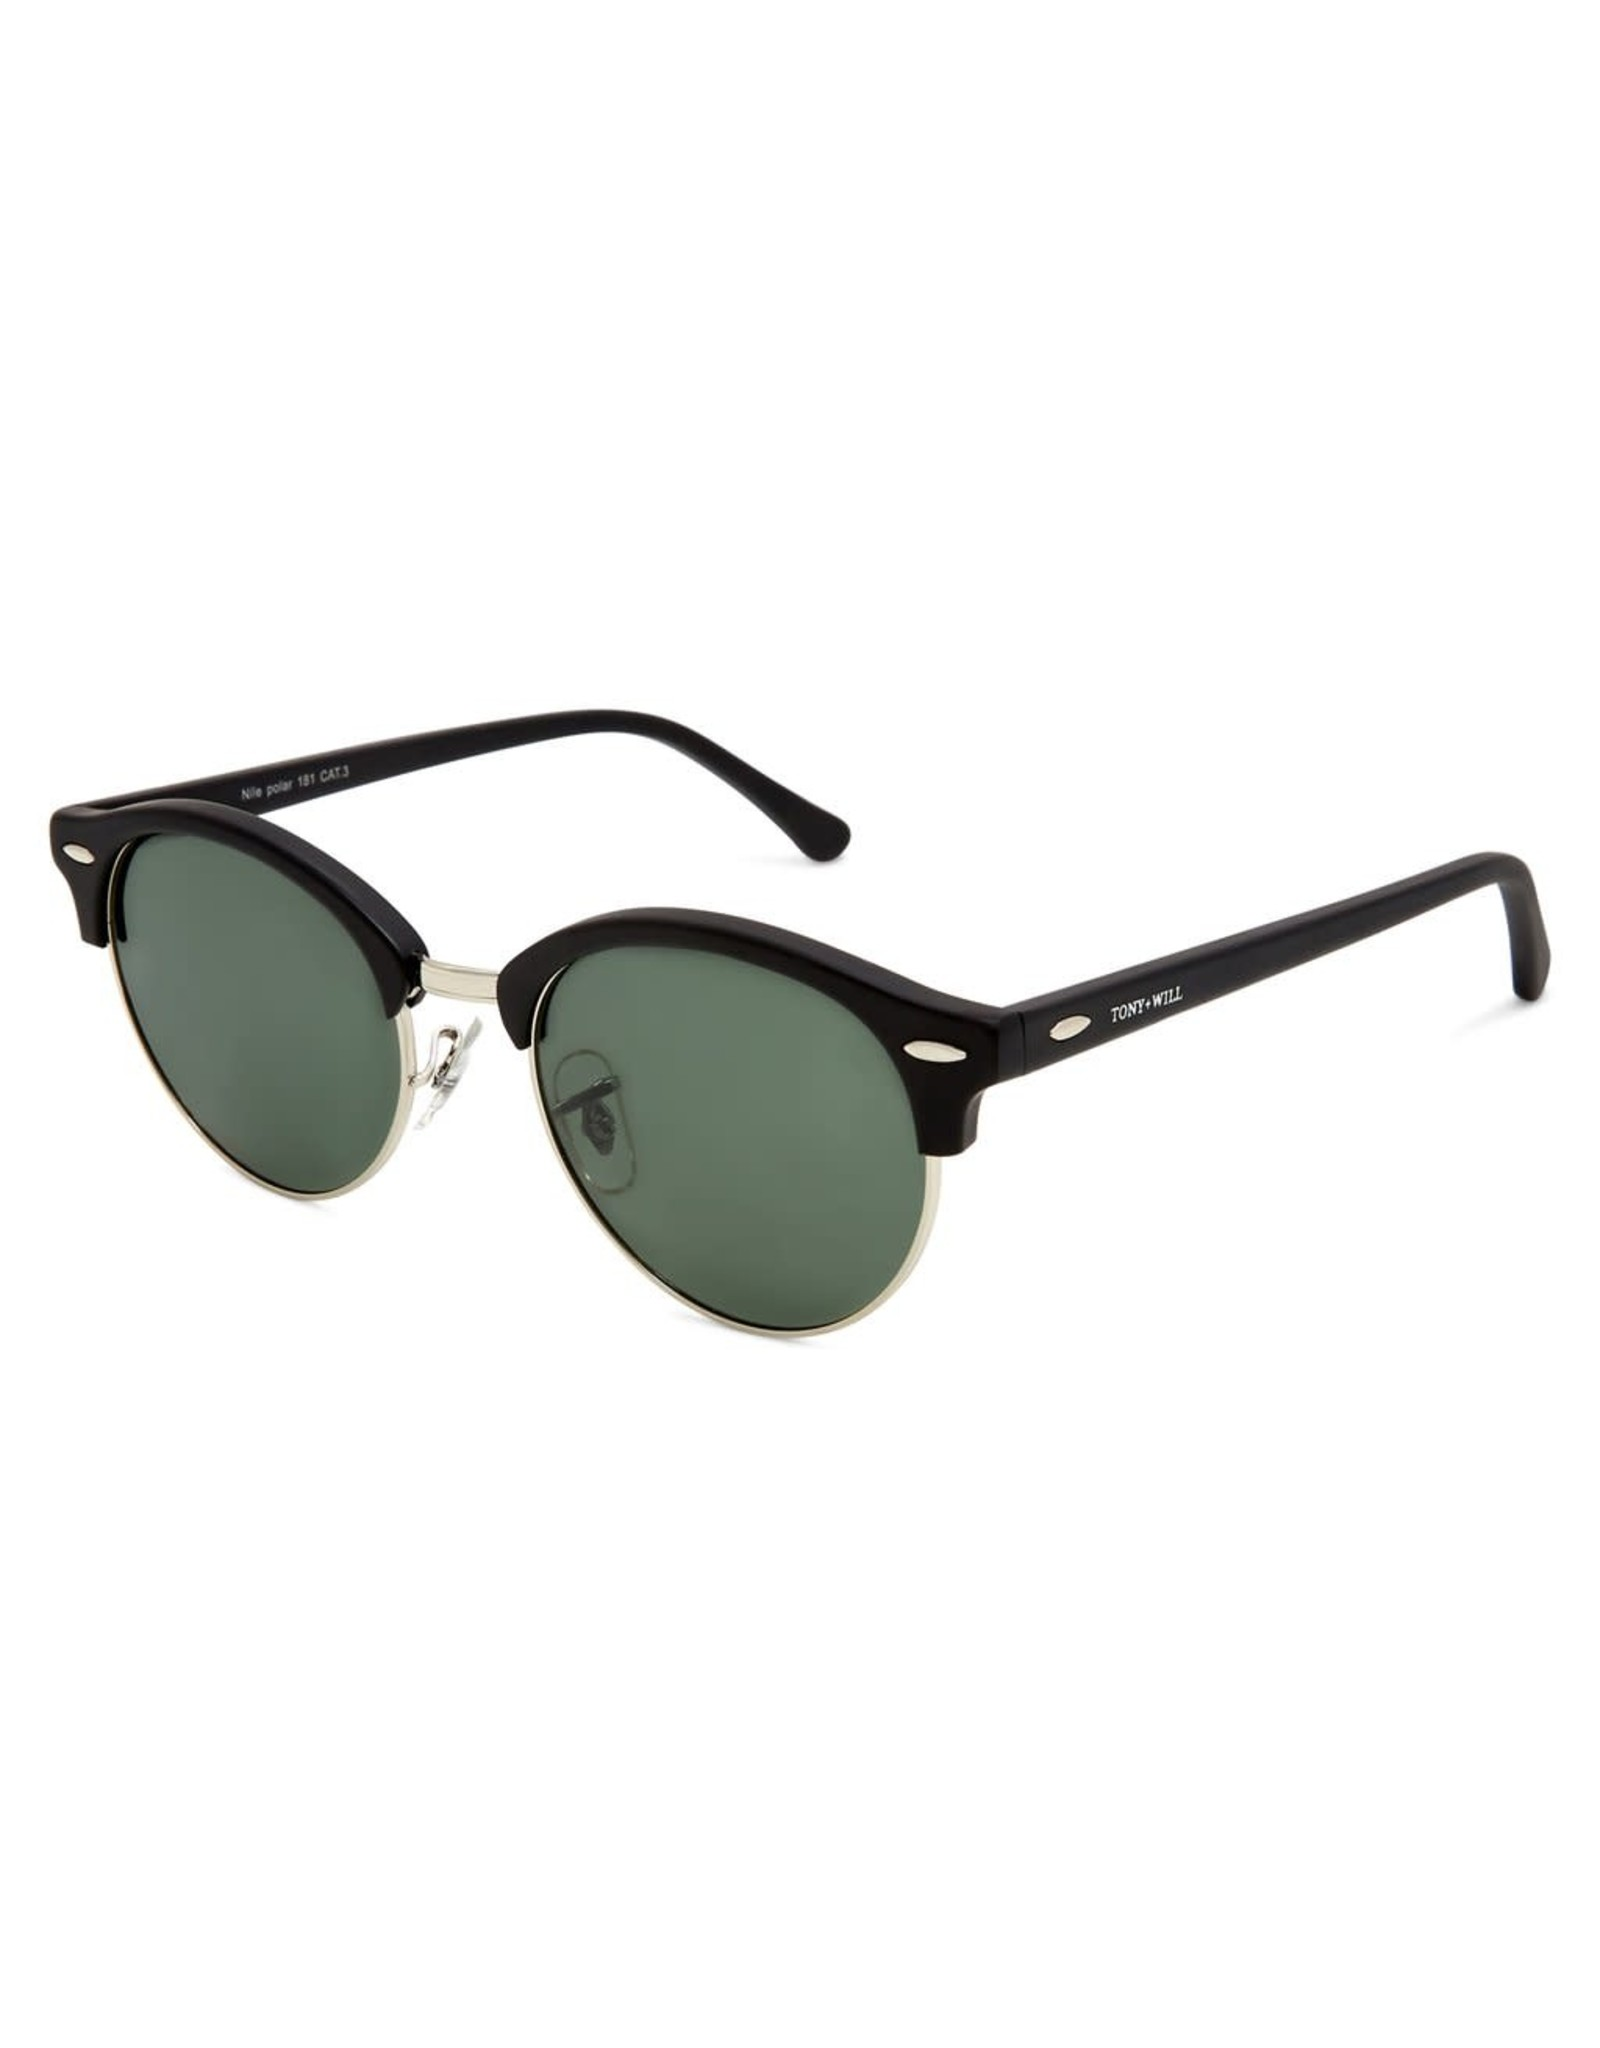 Nile Polarised Round Vintage Sunglasses with G15 lens